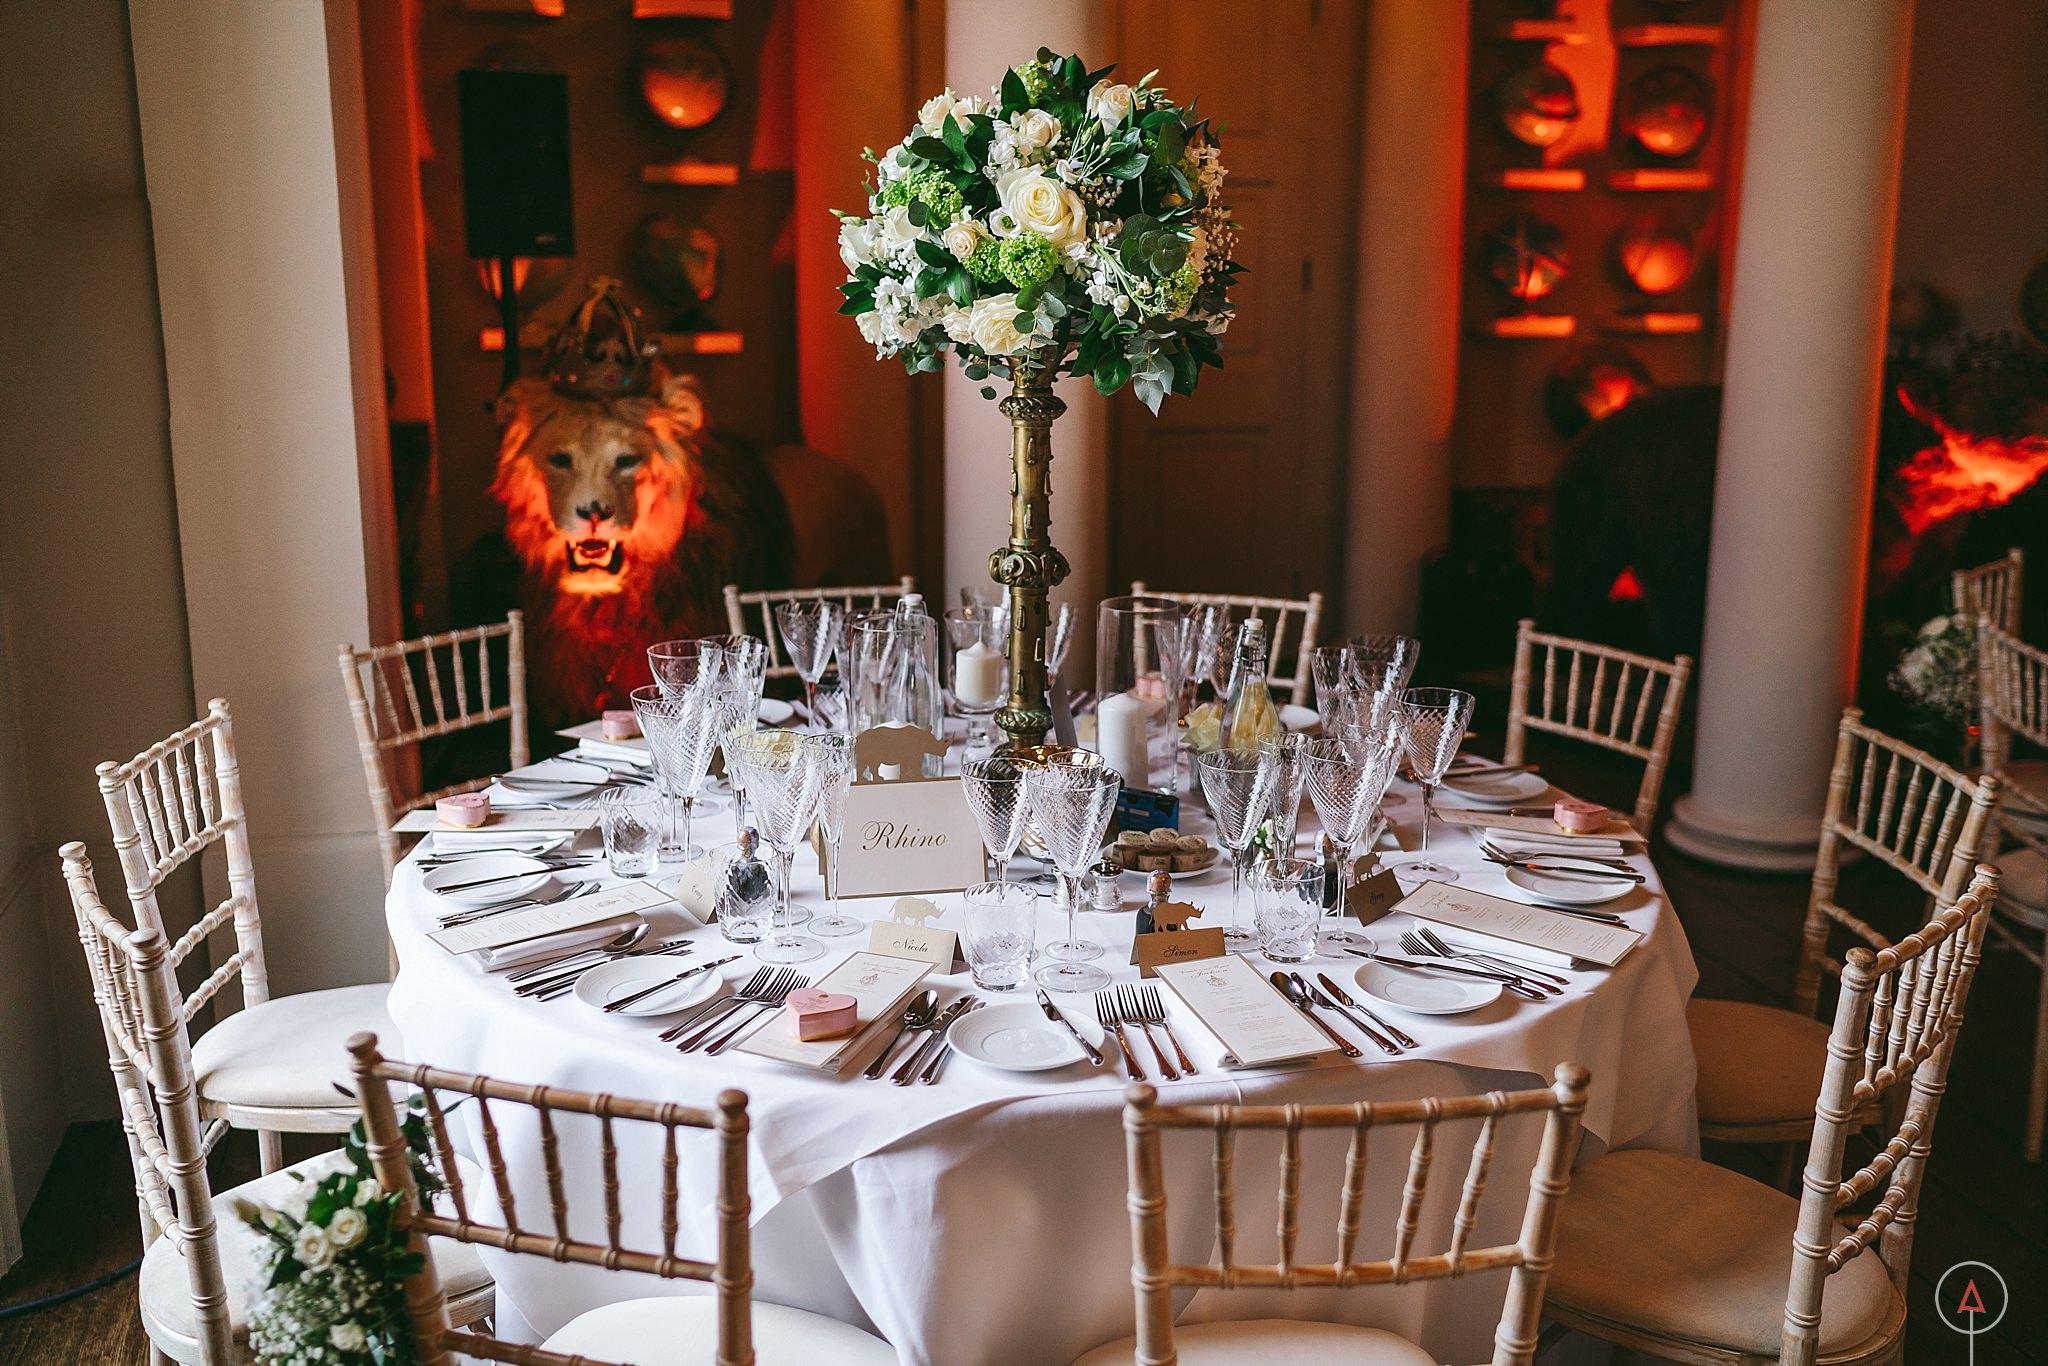 cardiff-wedding-photographer-aga-tomaszek_0293